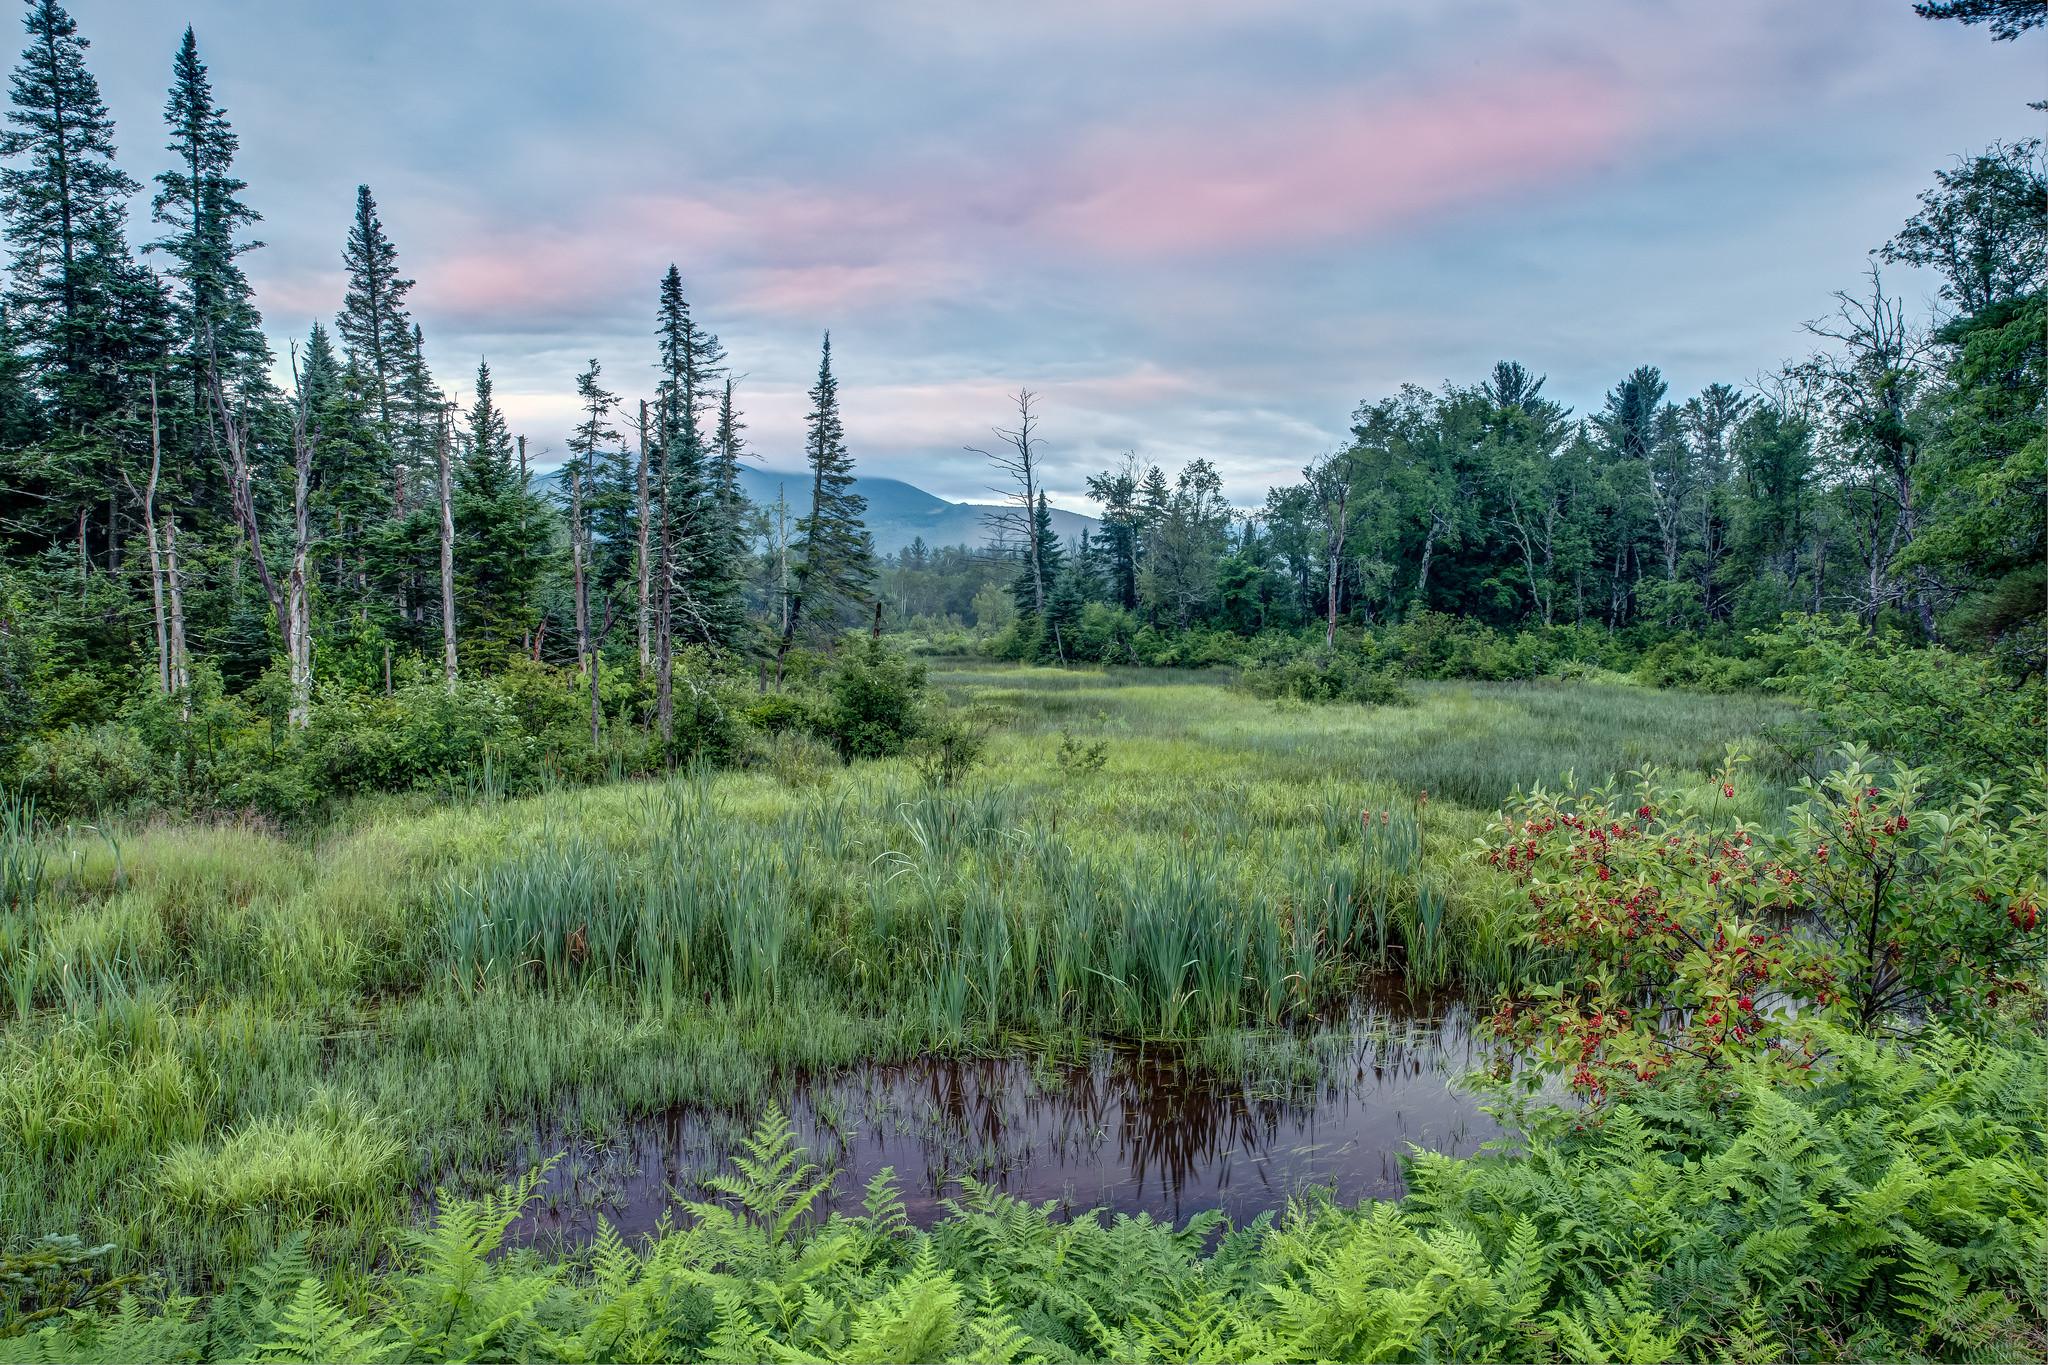 обои Нью-Гемпшир, Новая Англия, водоём, болото картинки фото